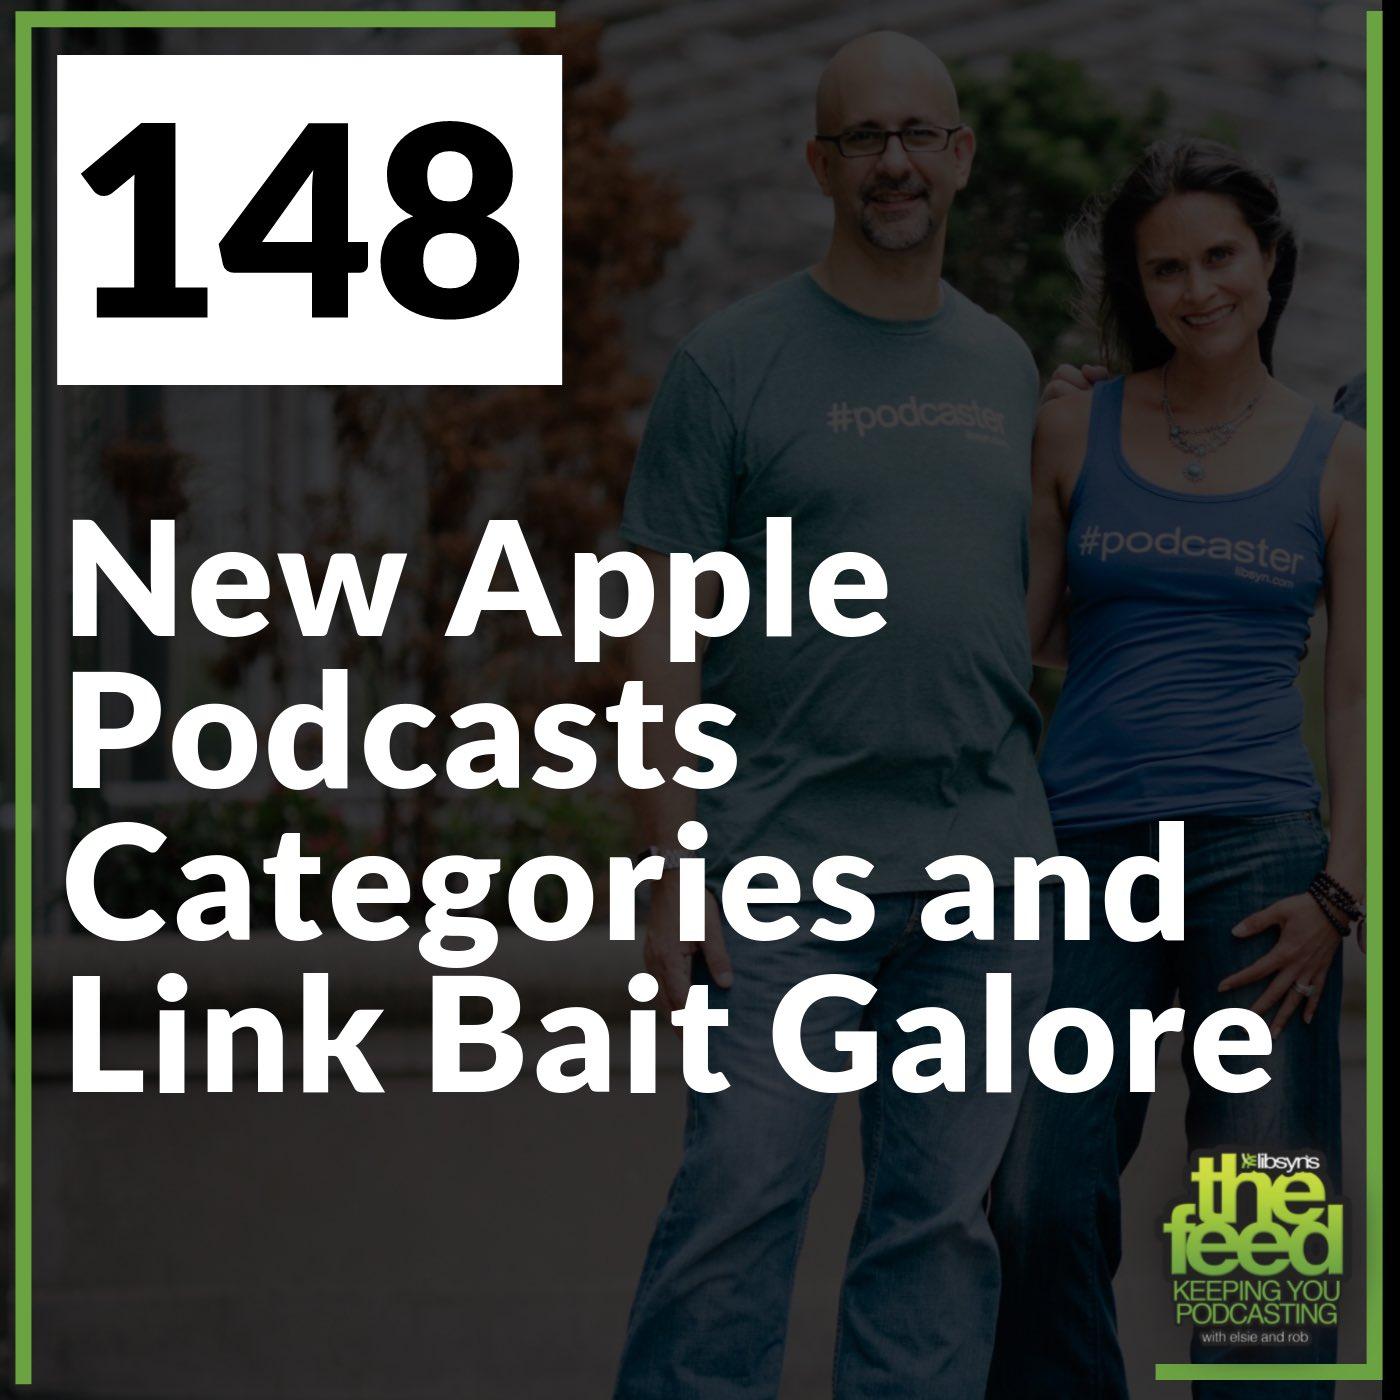 Best Episodes of Podnews podcasting news